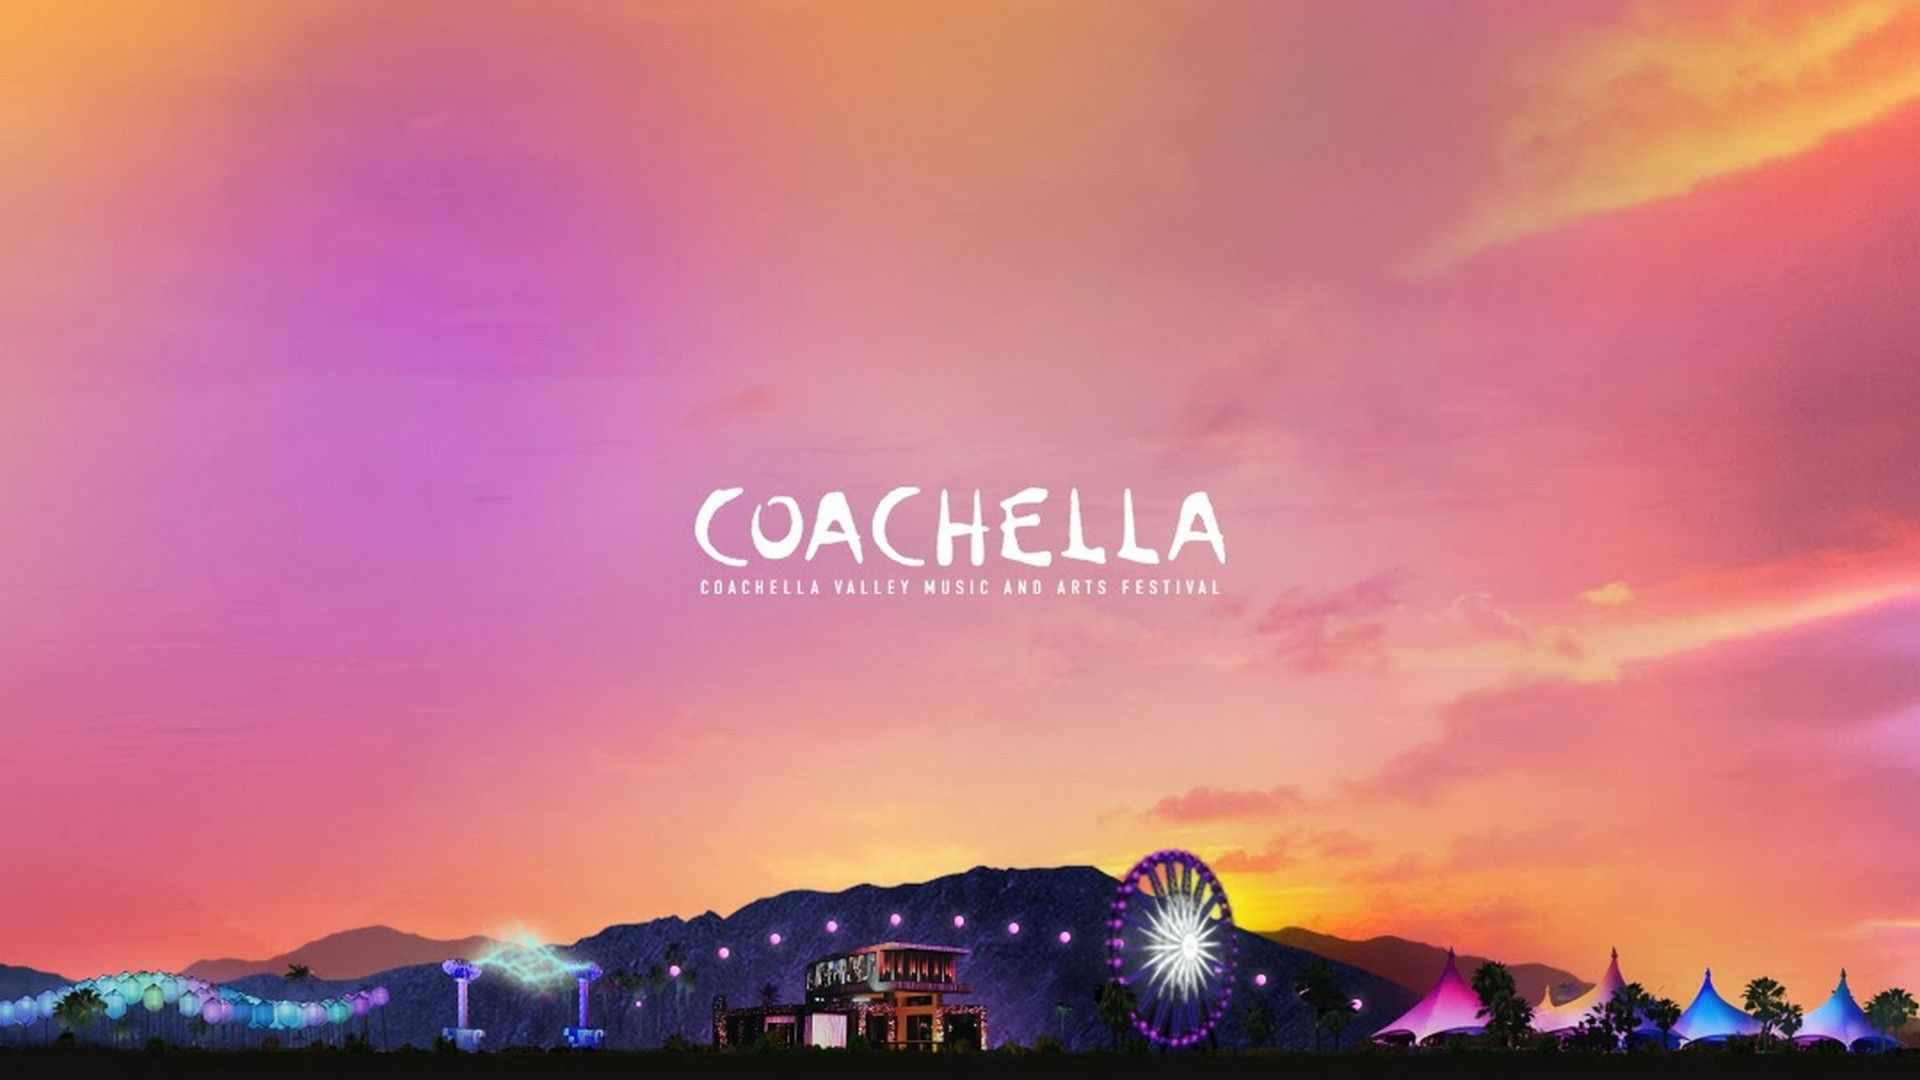 Best Coachella 2019 Wallpaper Hd Coachella The Daily Show